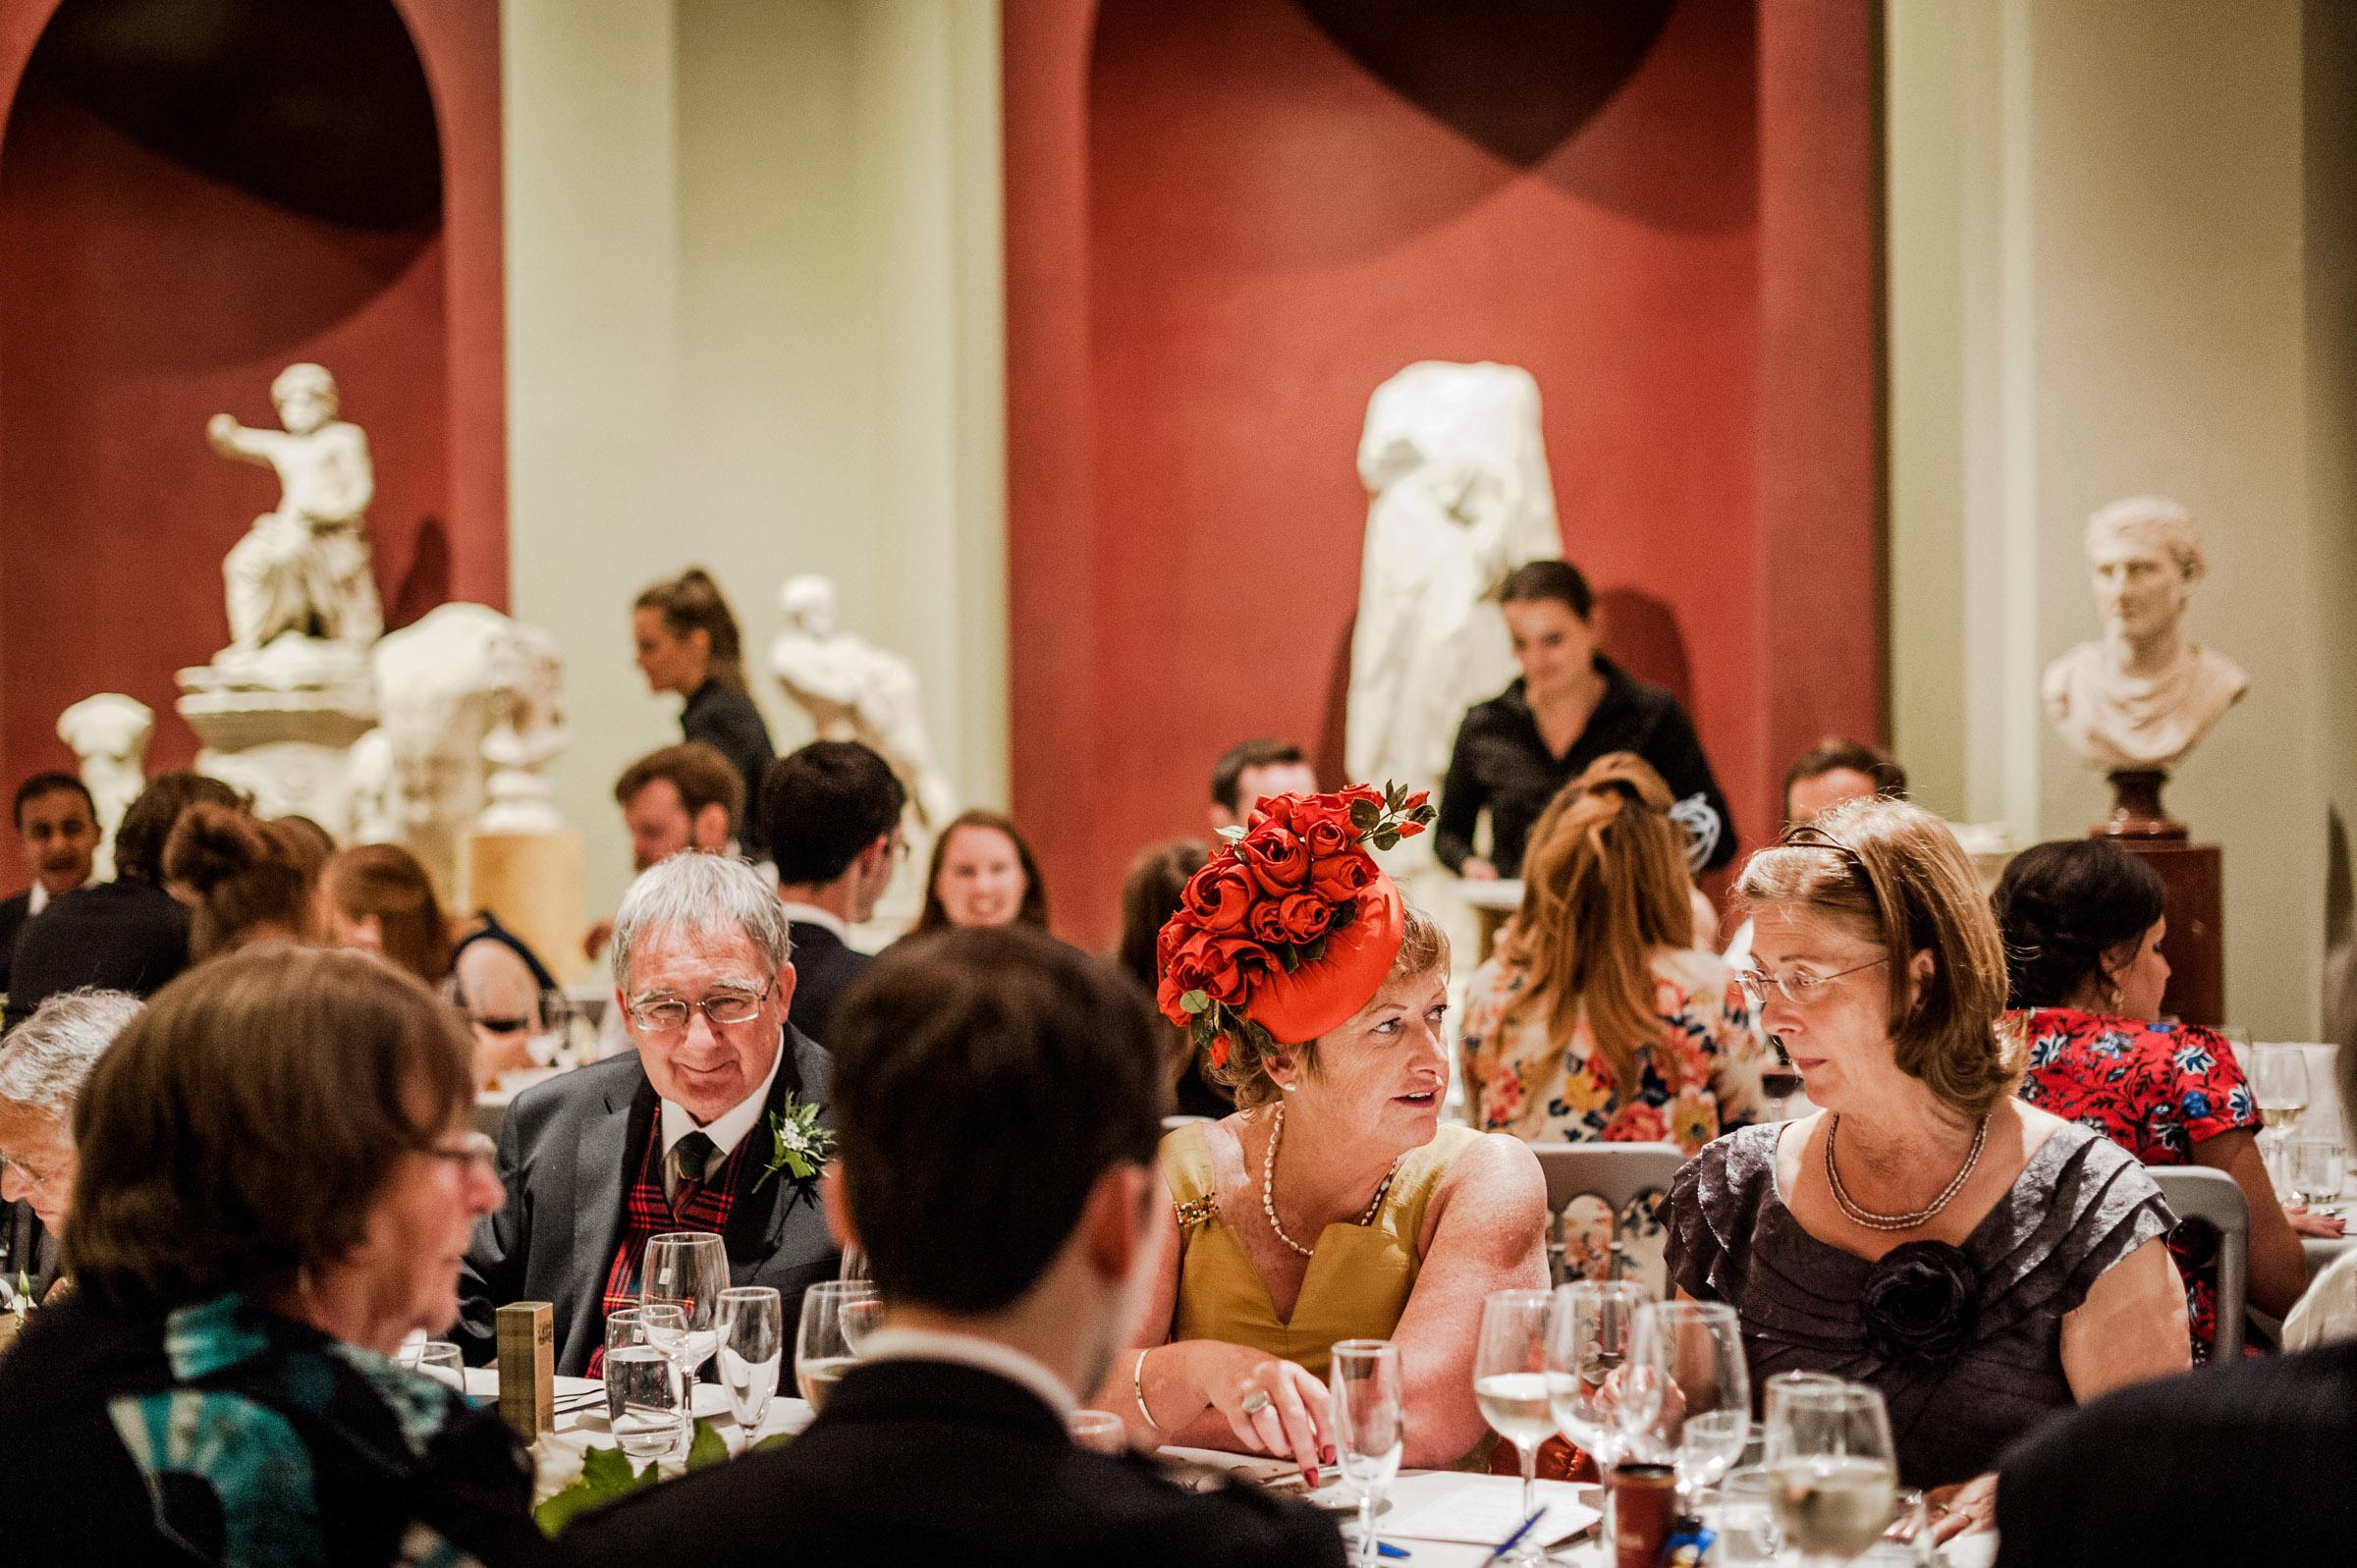 Ashmolean-Museum-Wedding-Pictures-0051.jpg